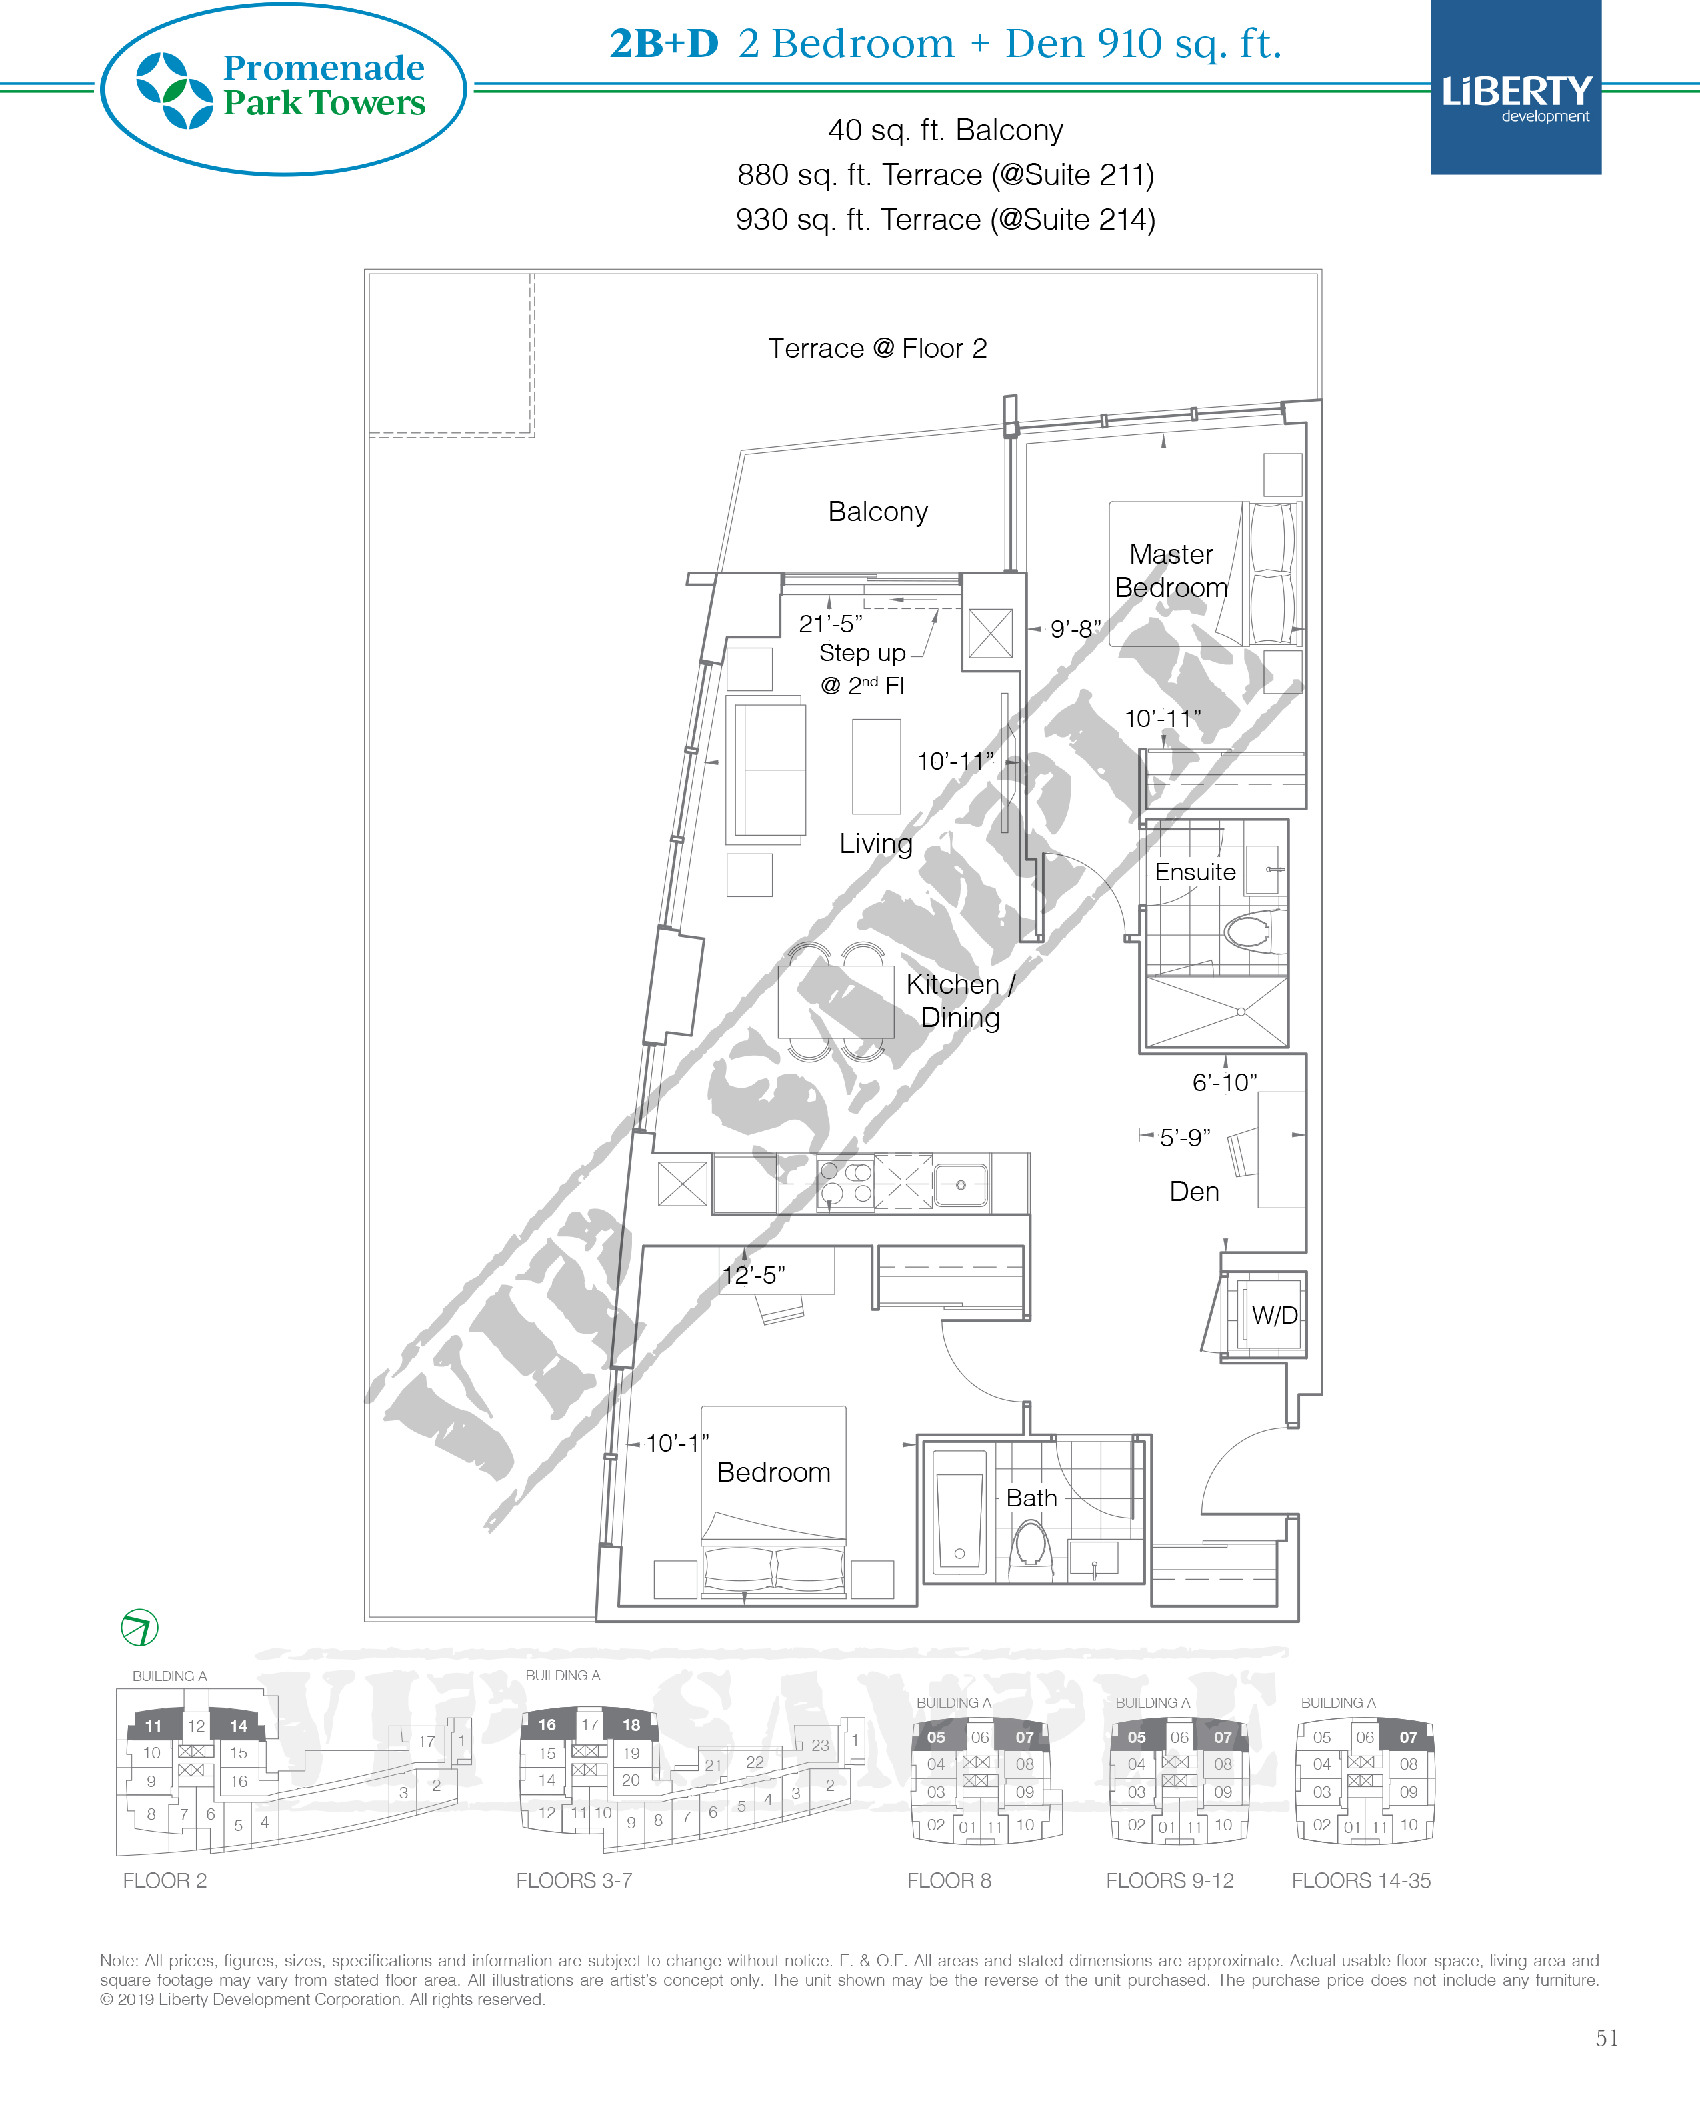 2B+D Floor Plan at Promenade Park Towers Condos - 910 sq.ft